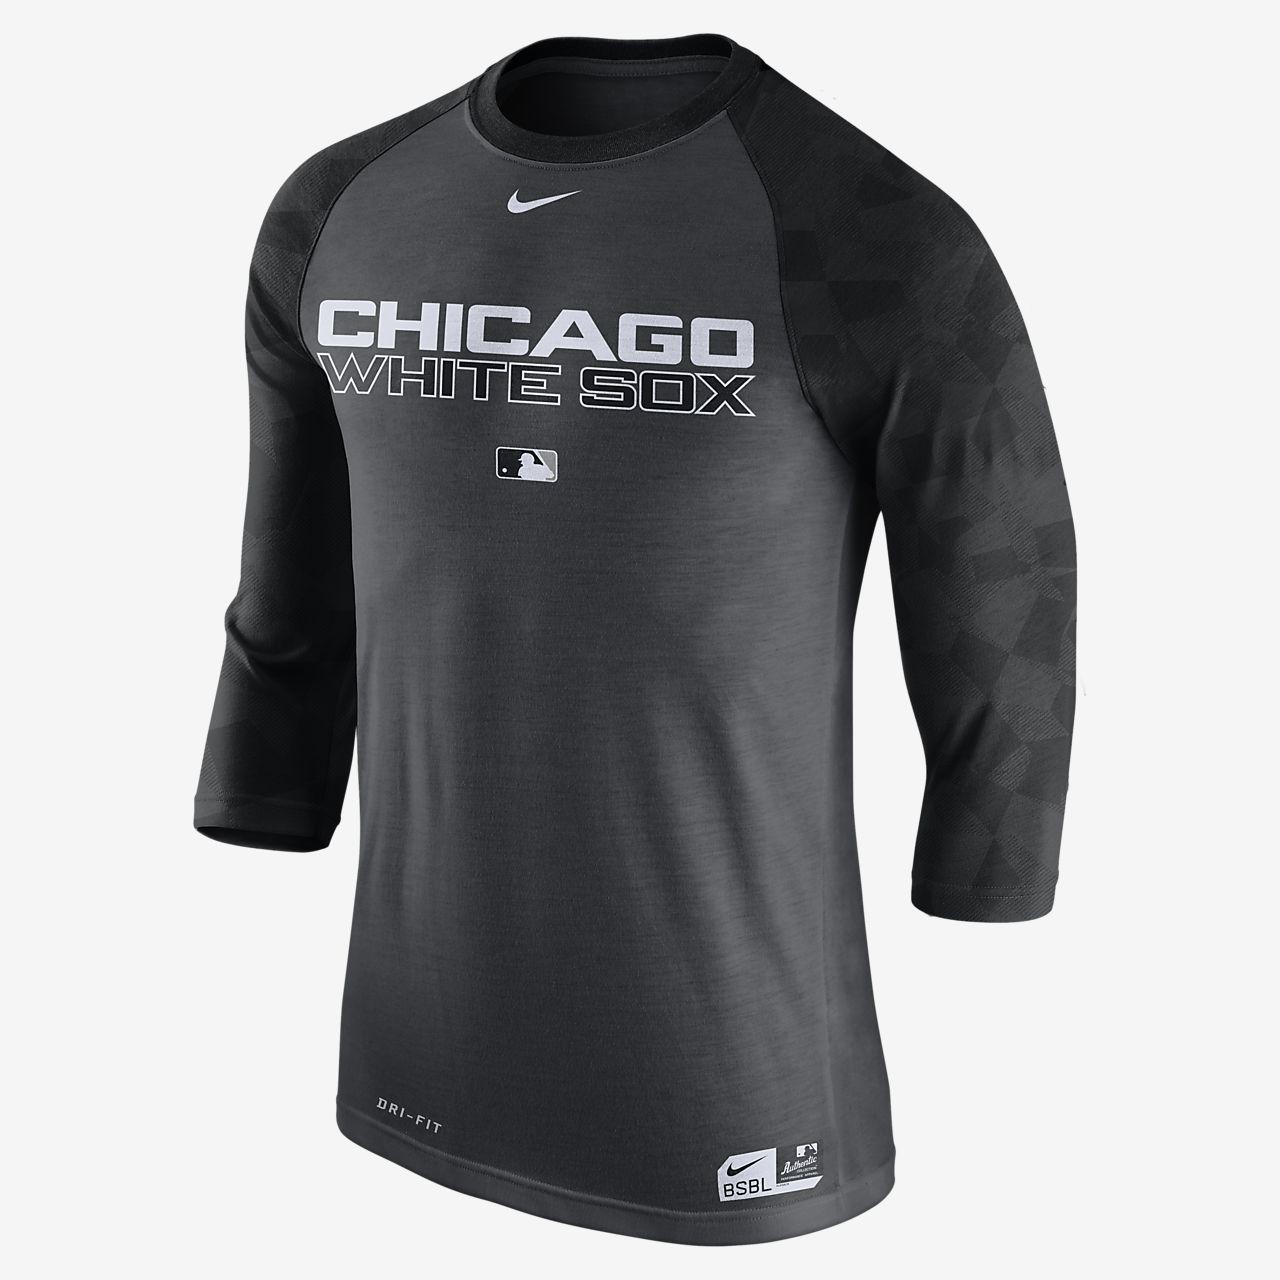 Nike Legend Raglan (MLB White Sox) Men's 3/4 Sleeve Top Charcoal Heather